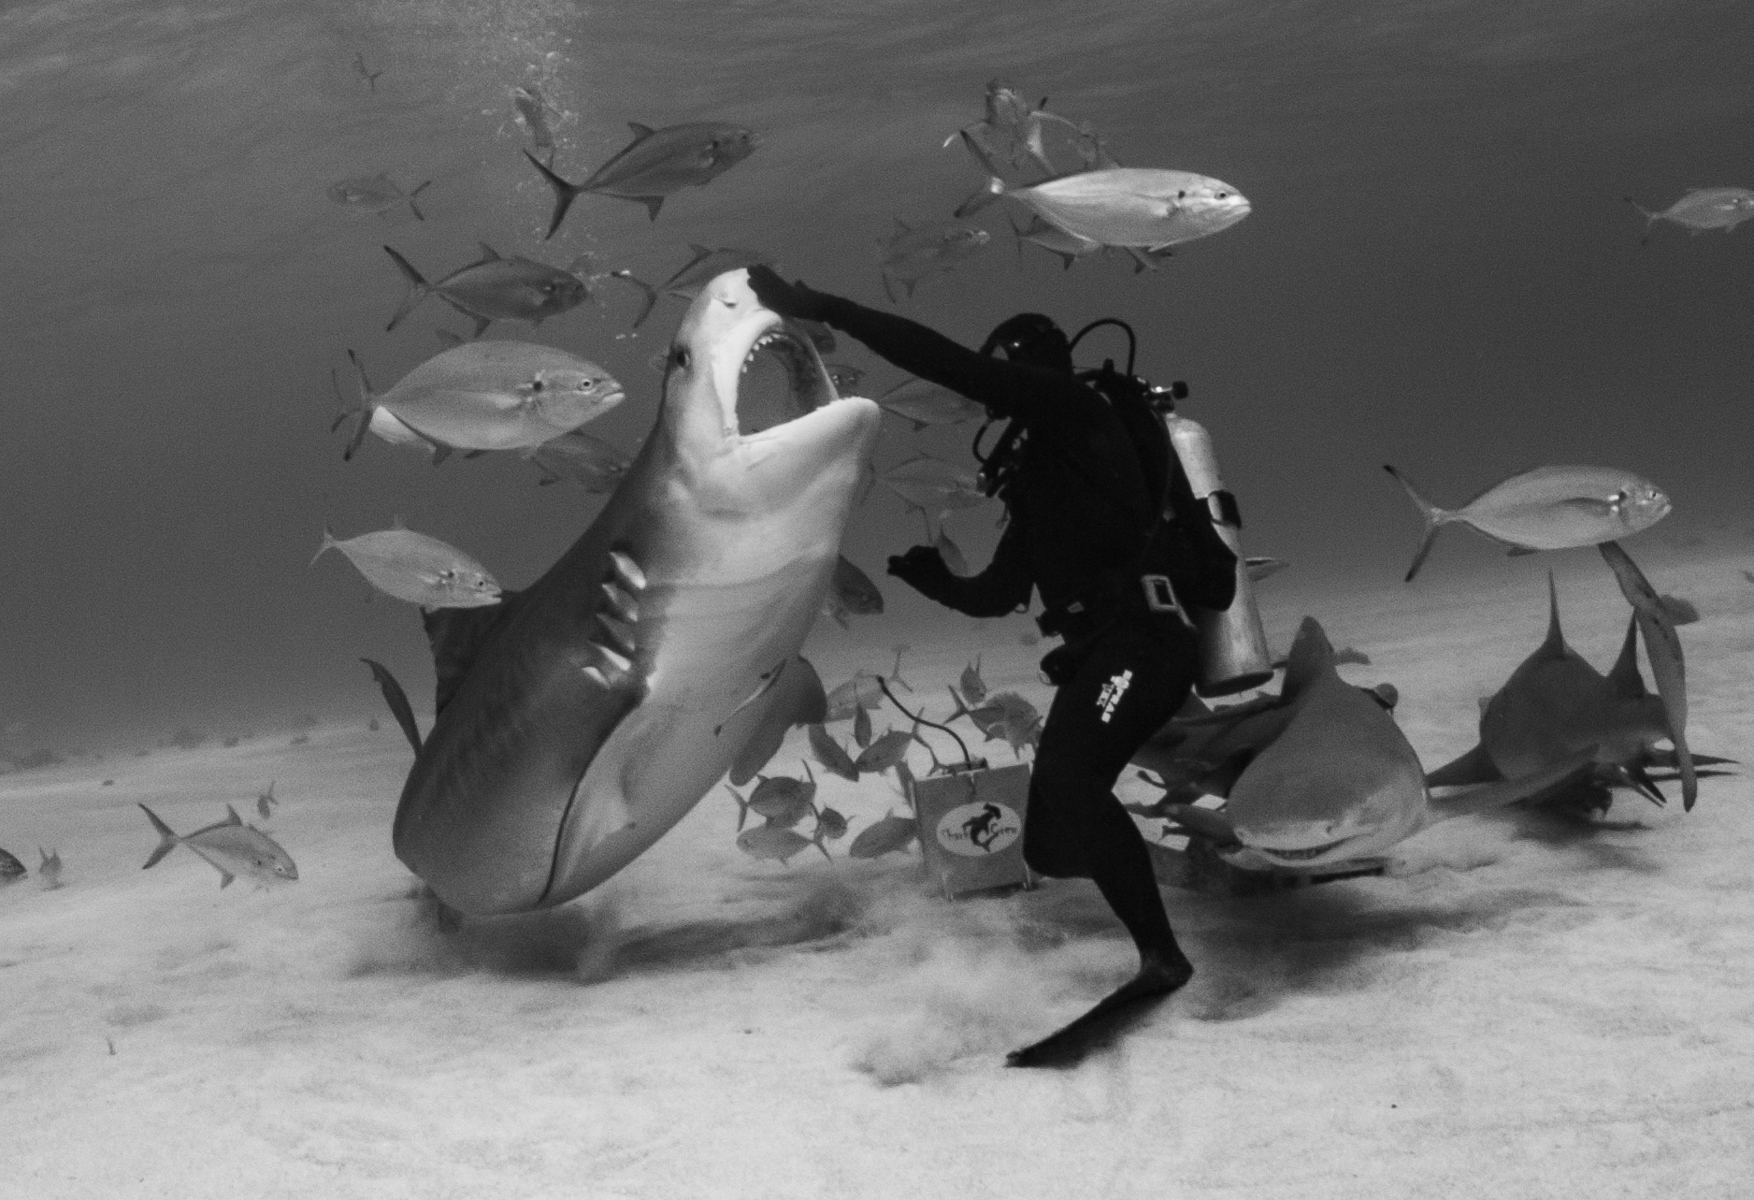 Grand-Bahamas-Tiger-Beach.-Tiger-Shark-feeding-MB-1-Place-by-Philip-Meyer-RO